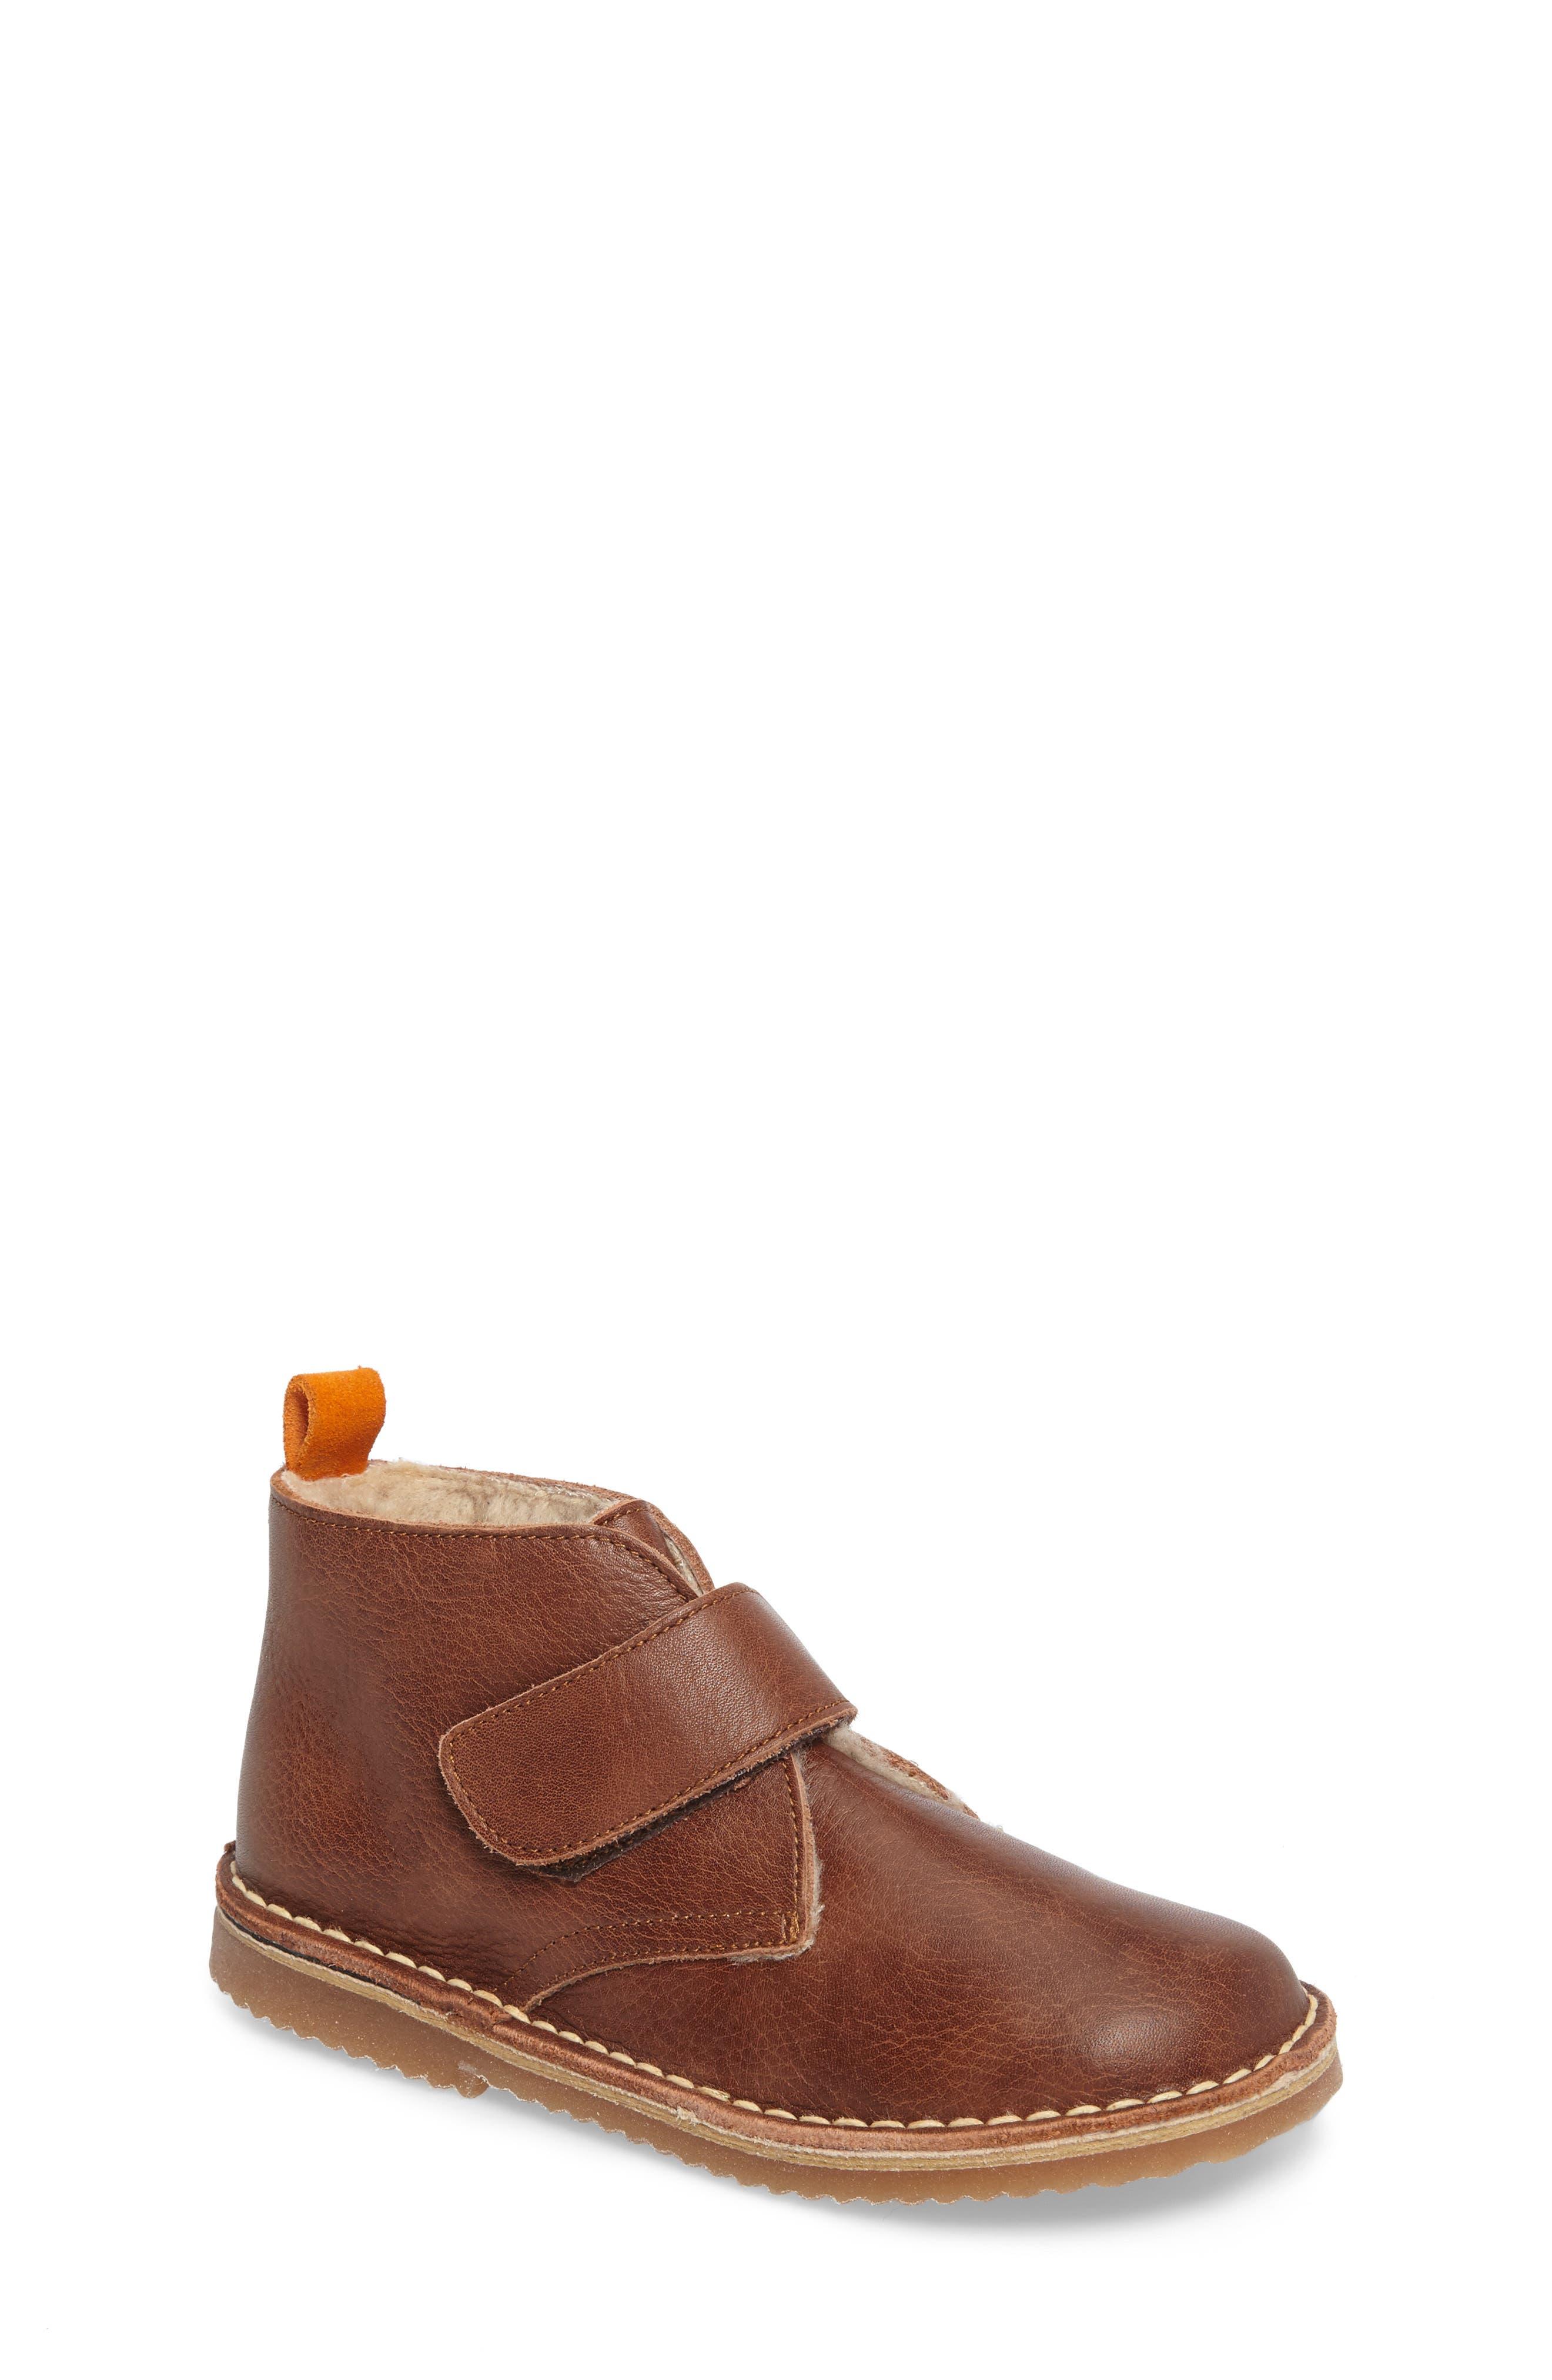 Faux Fur Desert Boot,                             Main thumbnail 1, color,                             Brown